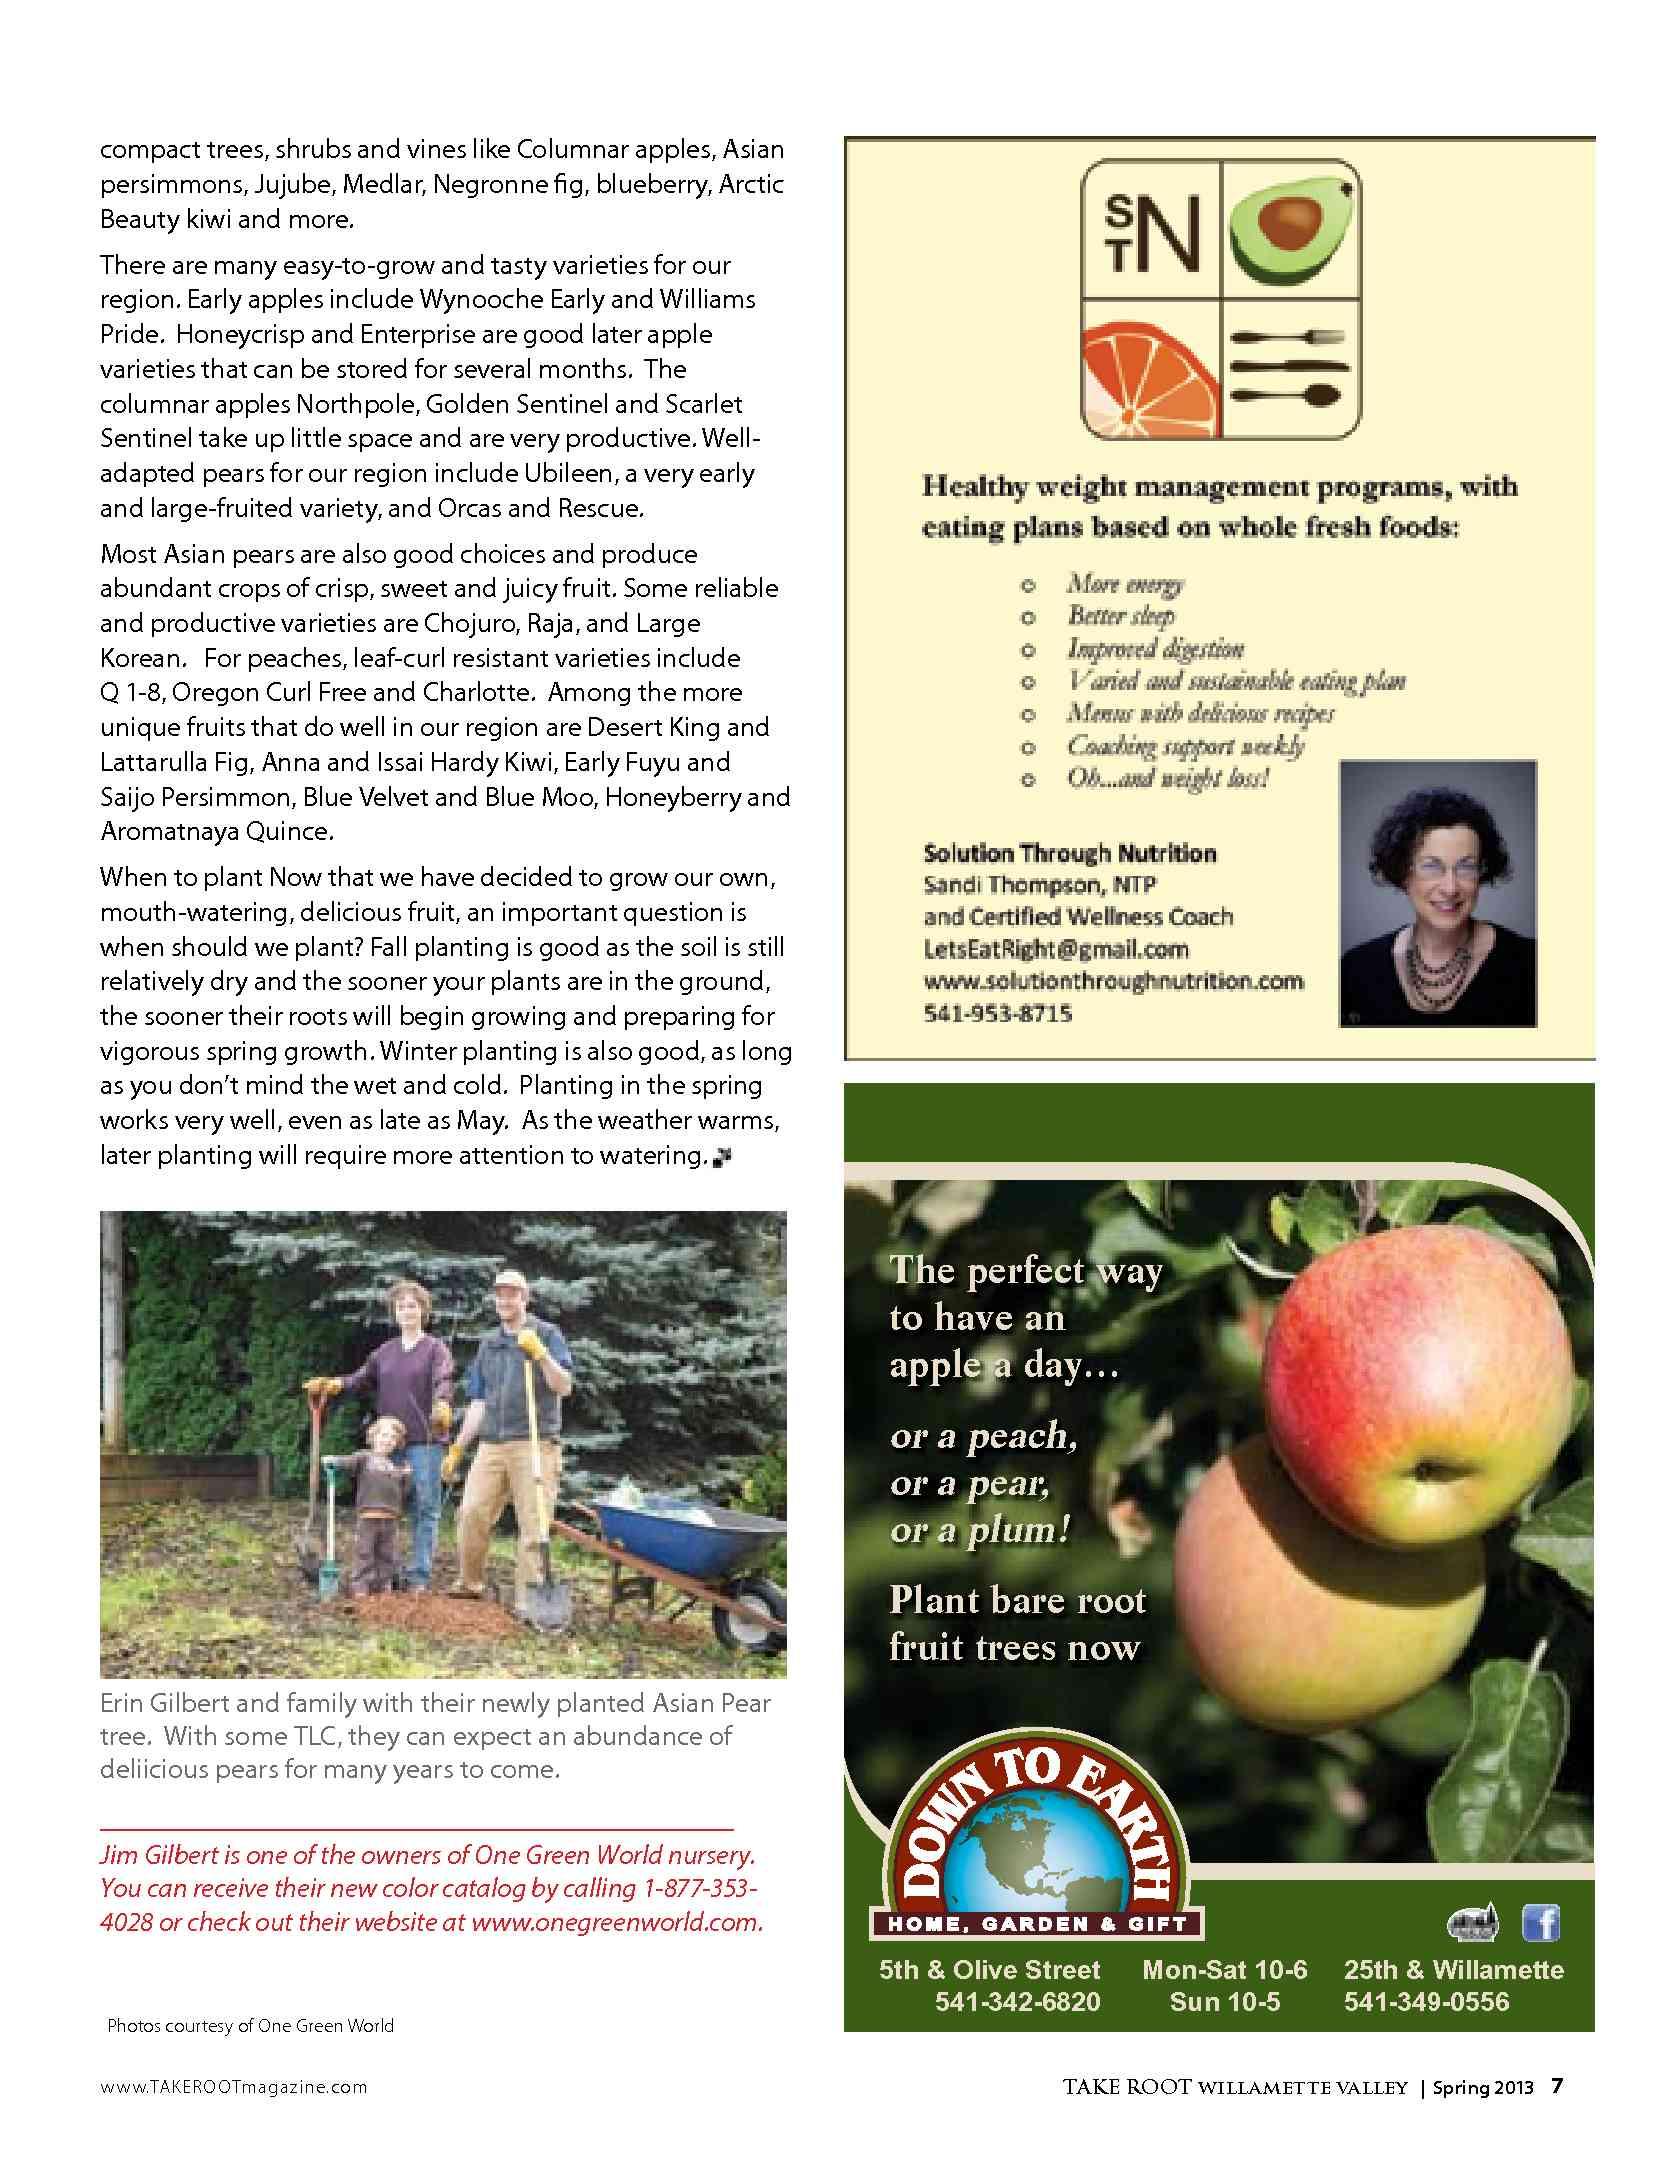 Duhn Associates Take Root Magazine Spring 2013